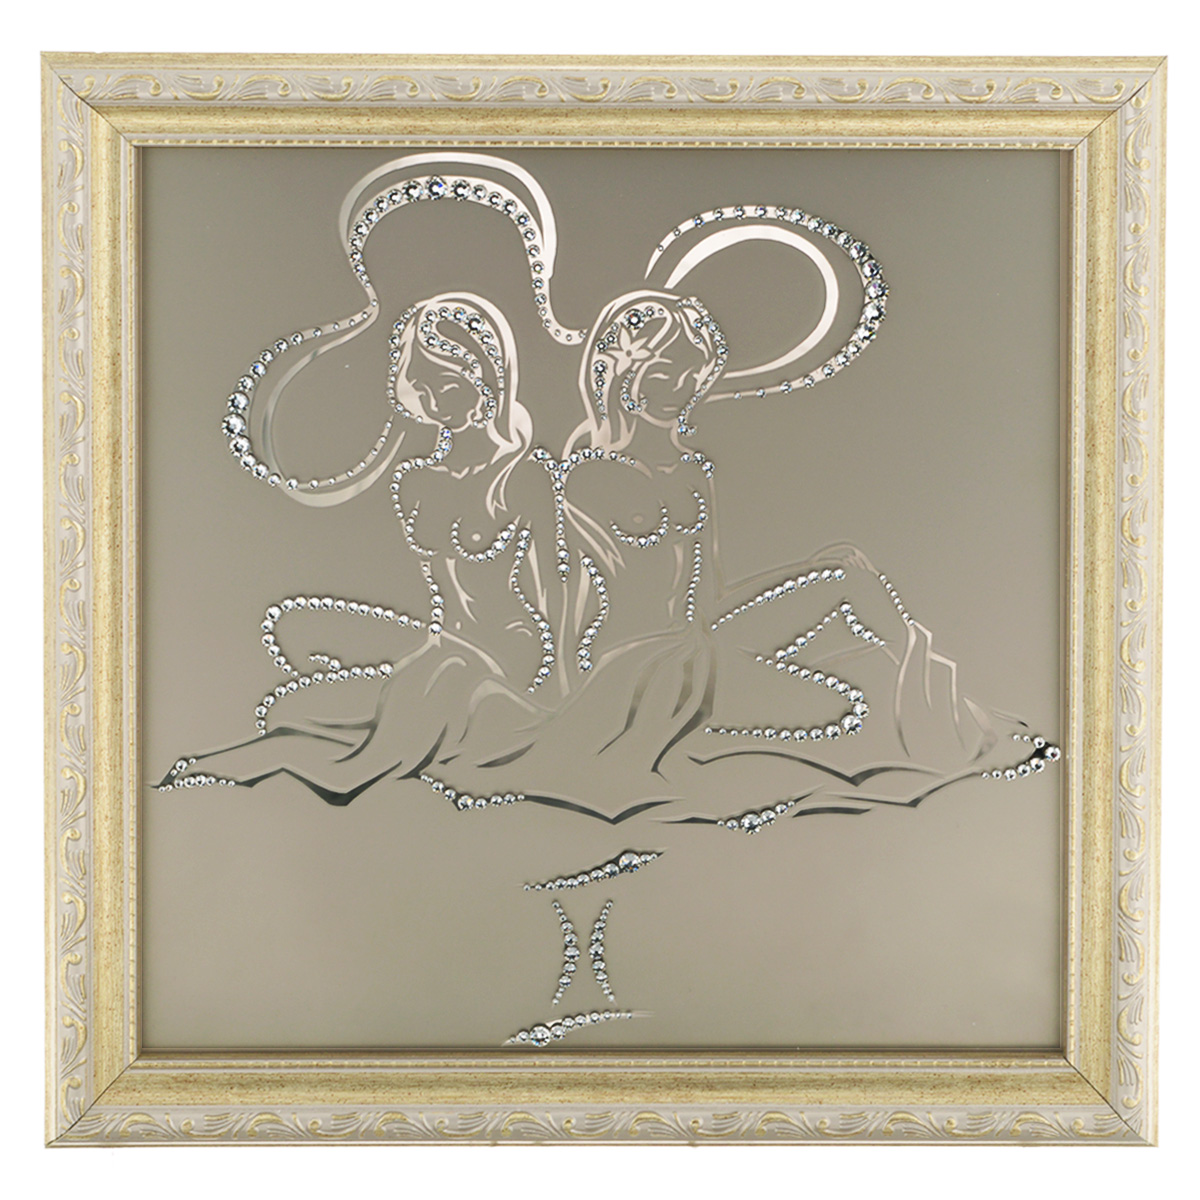 Картина с кристаллами Swarovski Знак зодиака. Близнецы, 35 см х 35 см